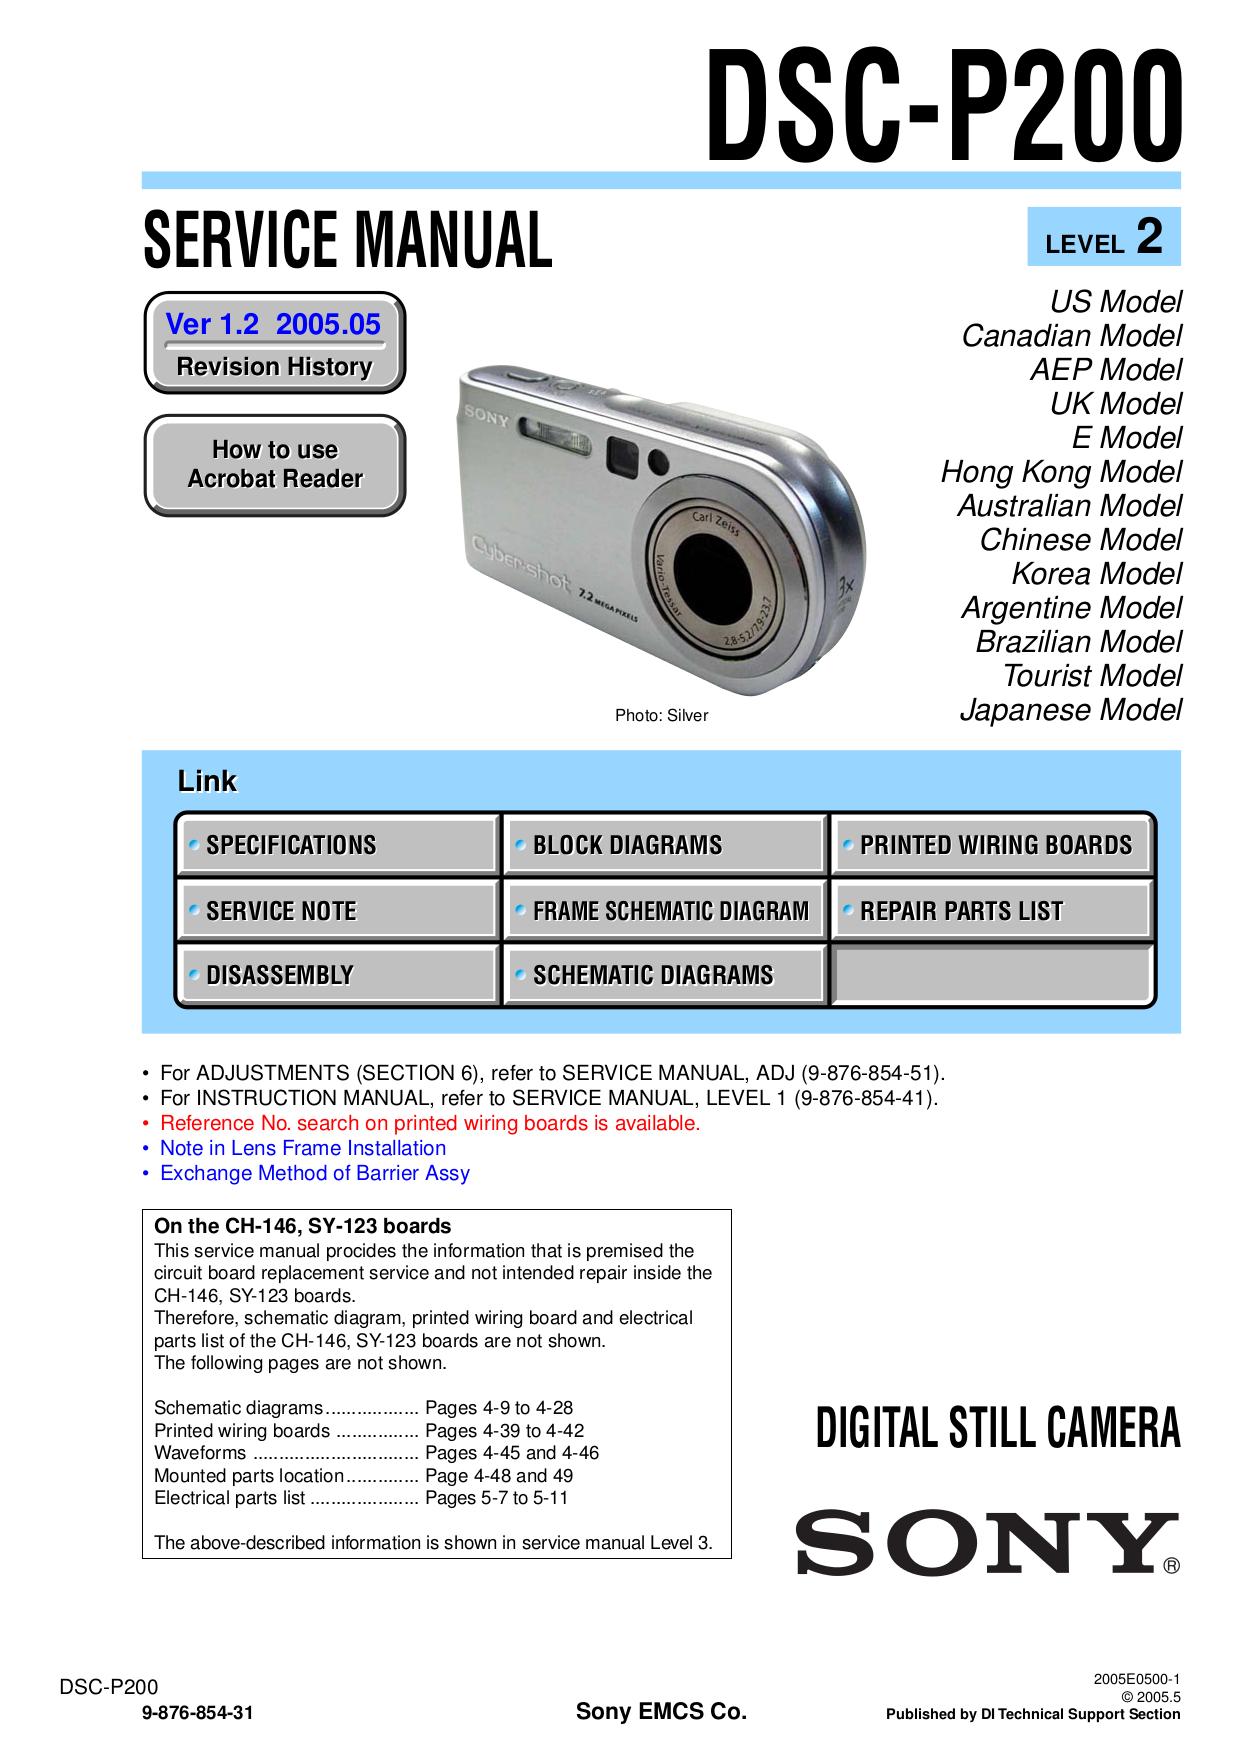 Download Free Pdf For Sony Cybershotcyber Shot Dsc P200 Digital Wiring Diagram Camera Manual